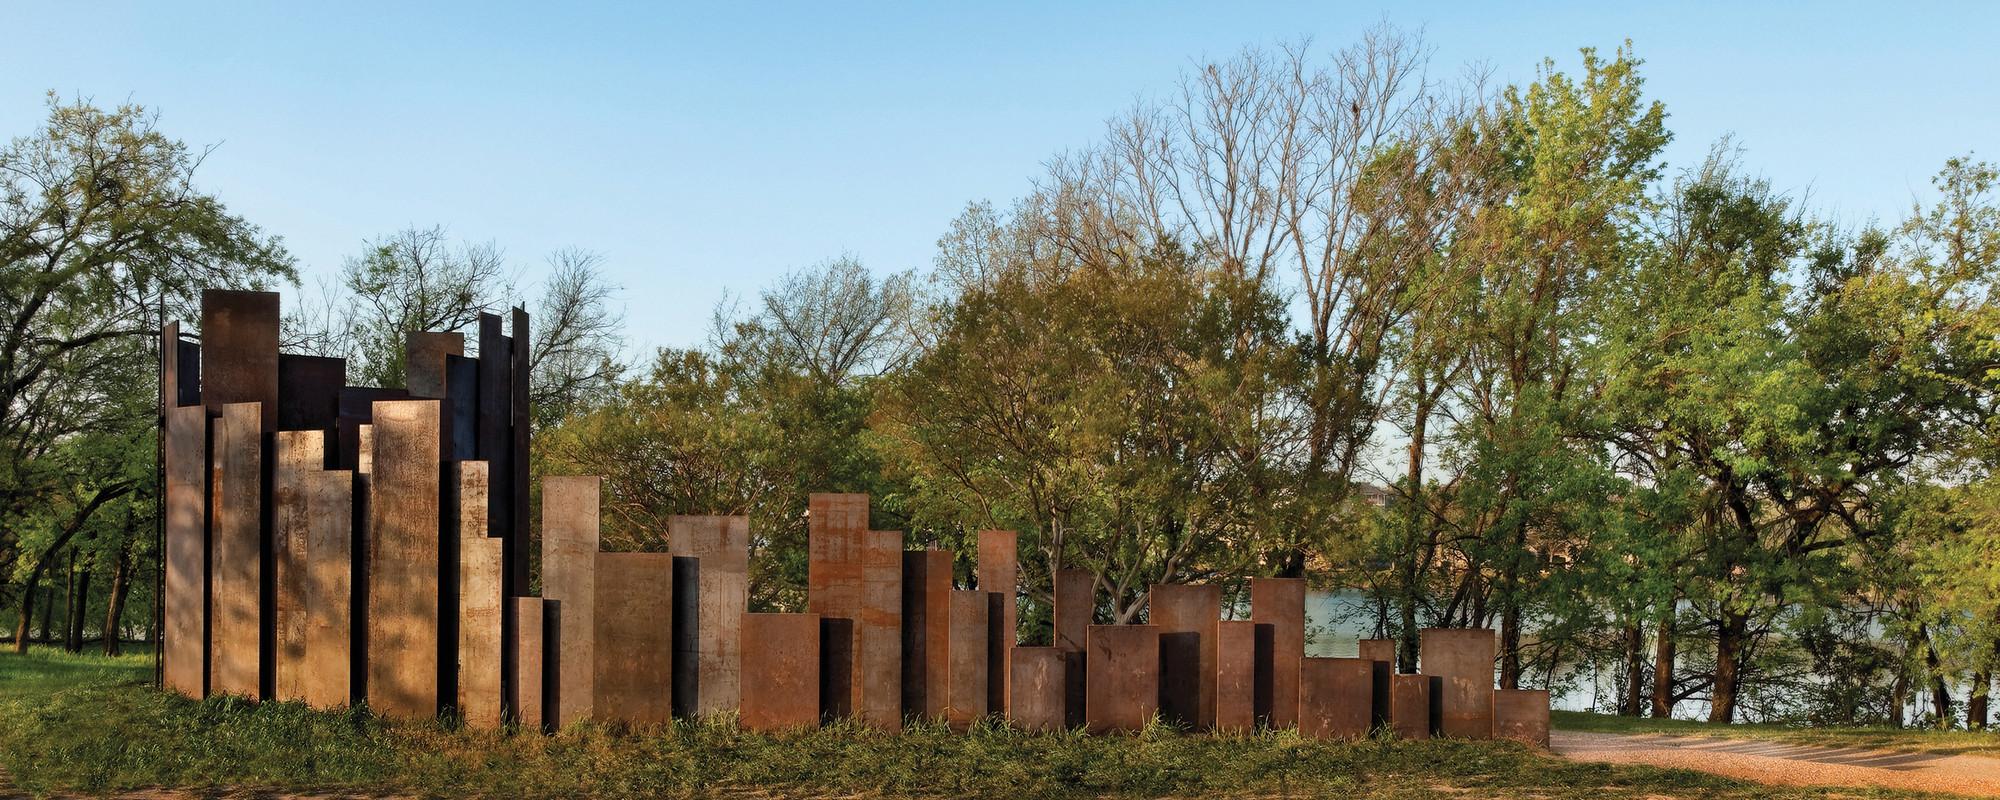 Banheiro Público / Miro Rivera Architects